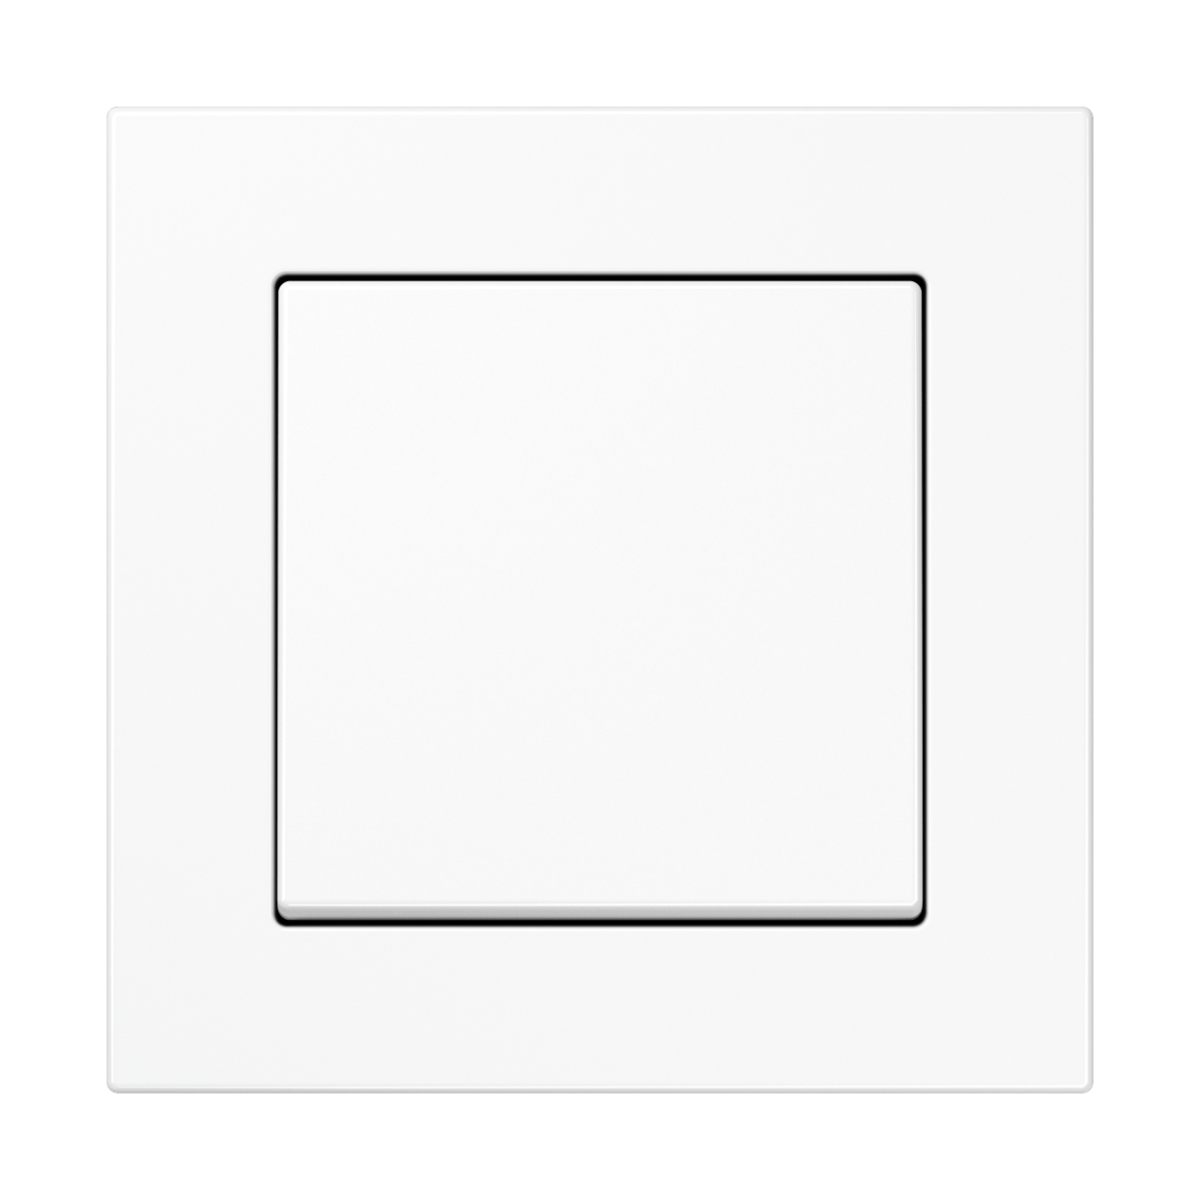 Variasi A 550 White Series  LightingInterior LightingLighting Components 8